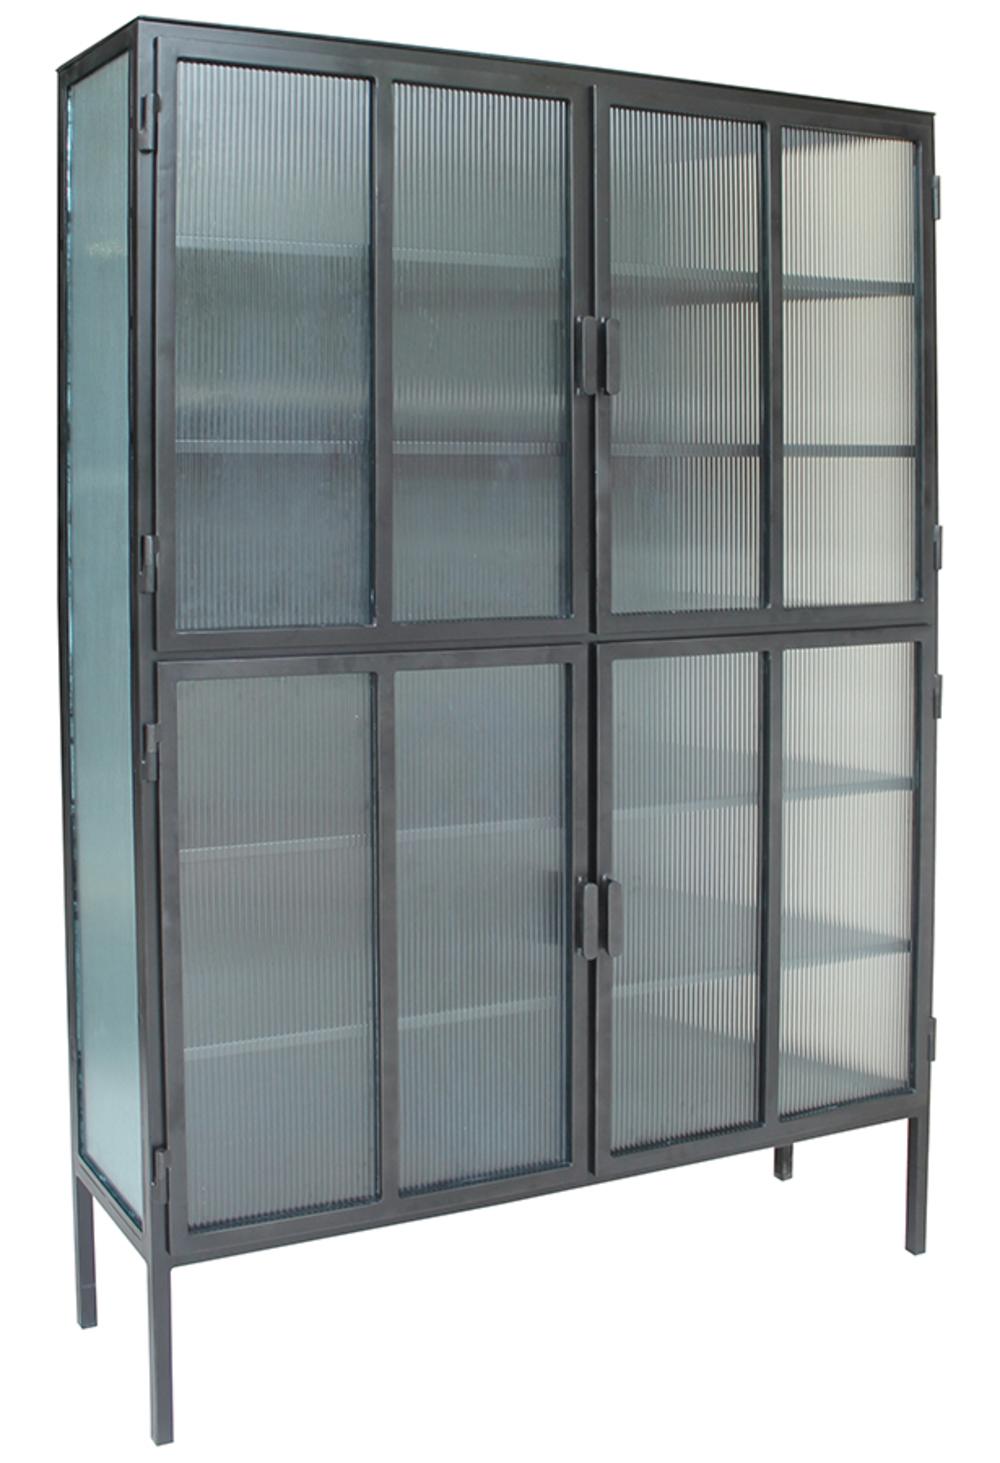 Dovetail Furniture - Verani Cabinet